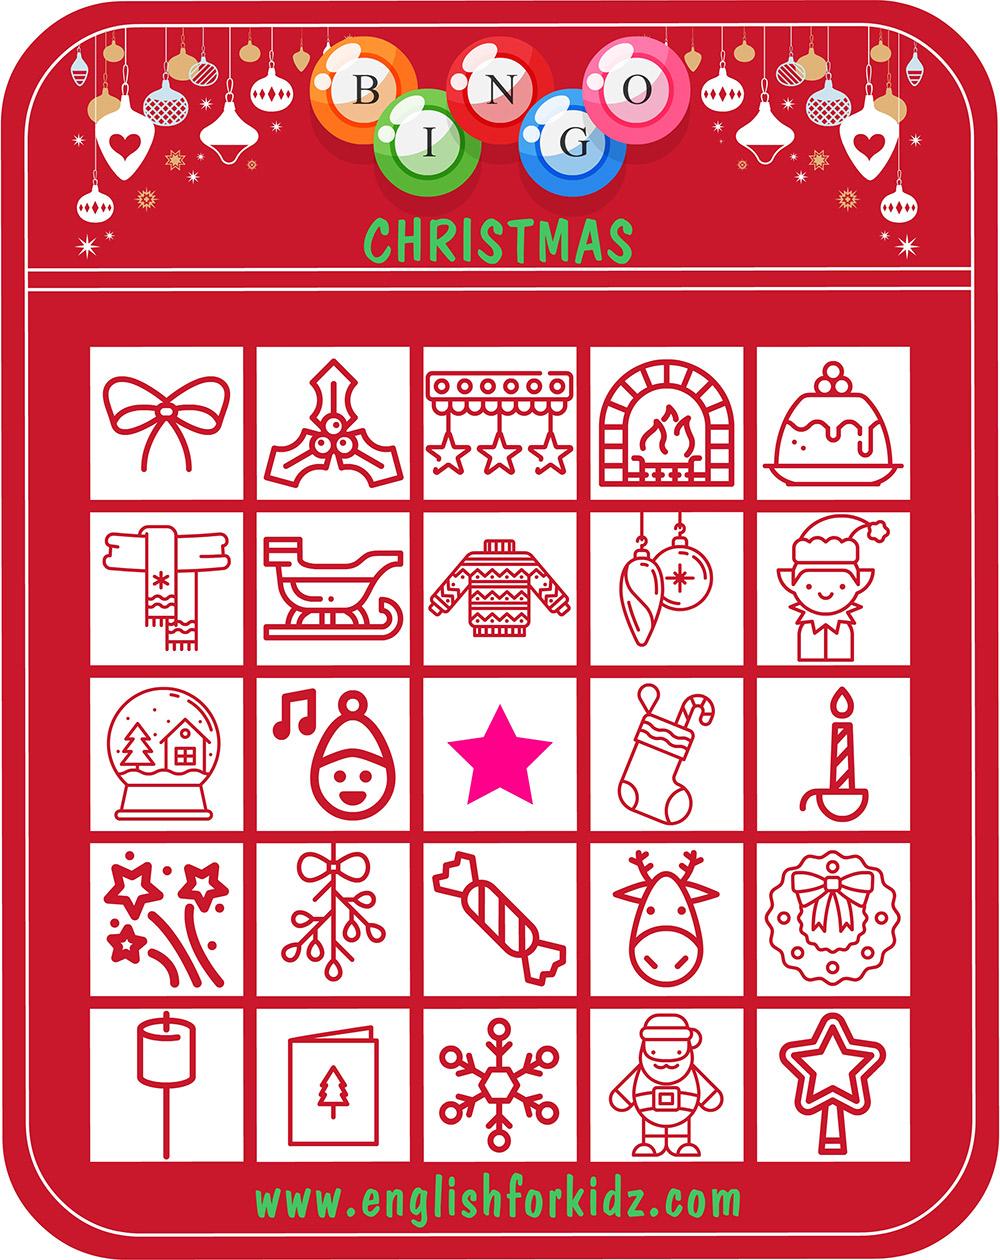 photograph relating to Printable Christmas Bingo Cards named ESL Xmas Bingo Activity